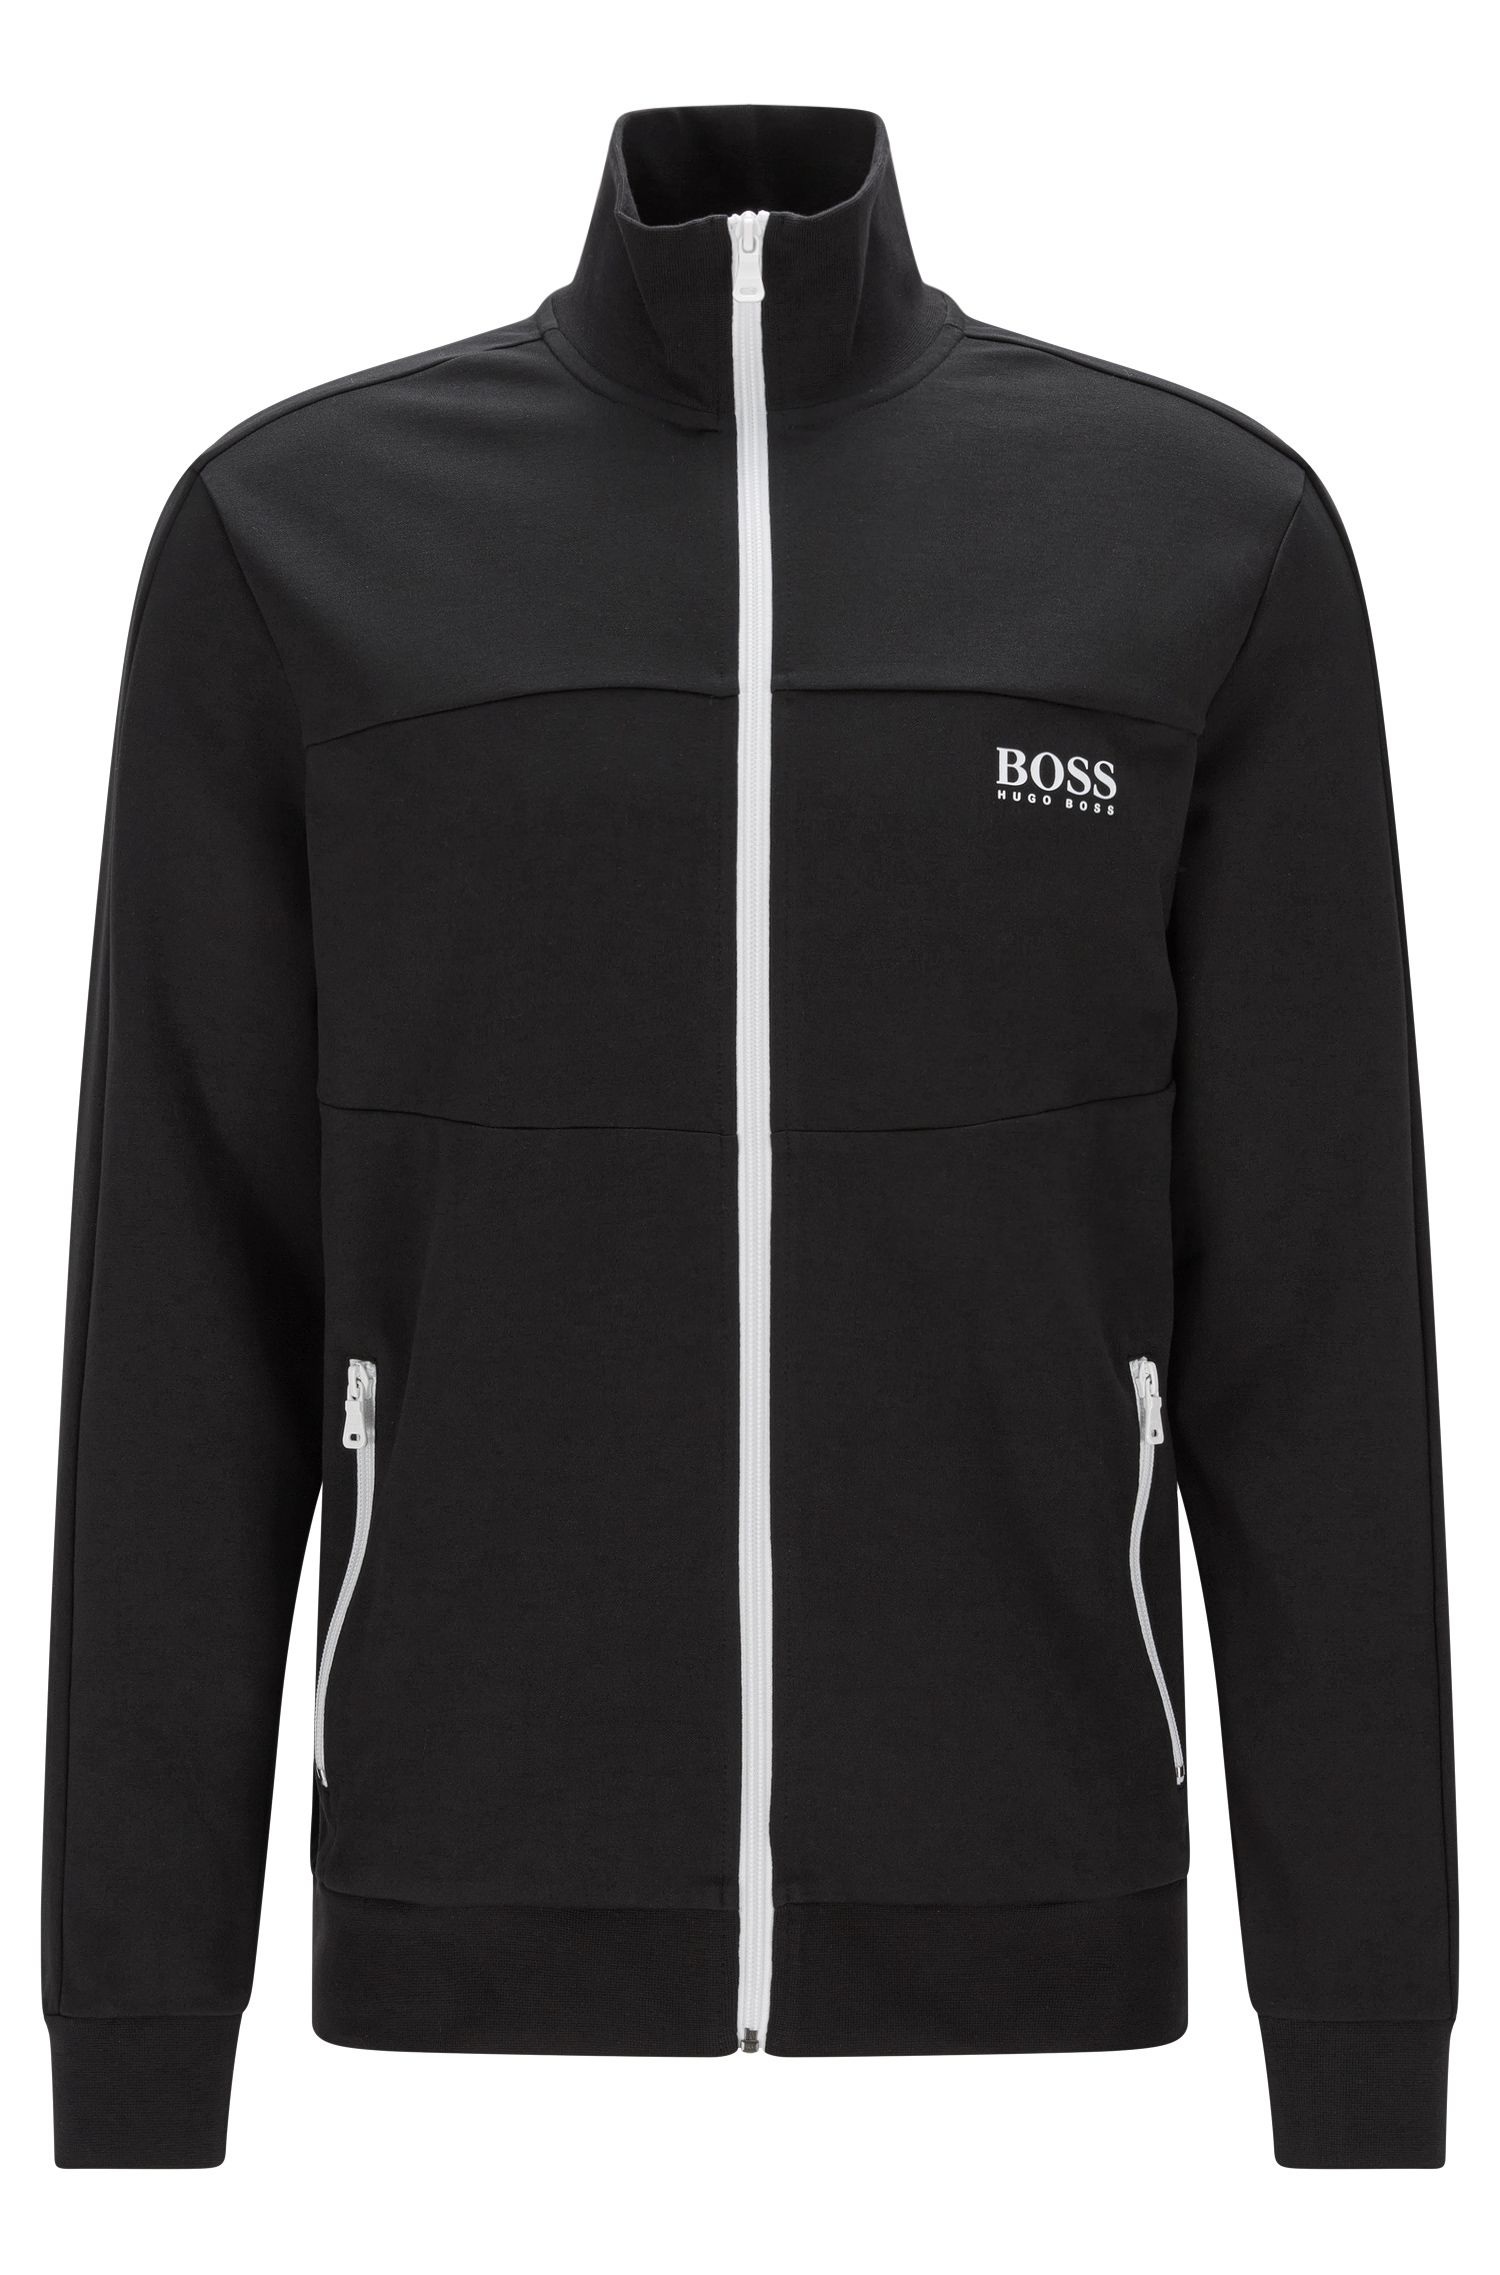 'Jacket Zip' | Cotton Blend Track Jacket